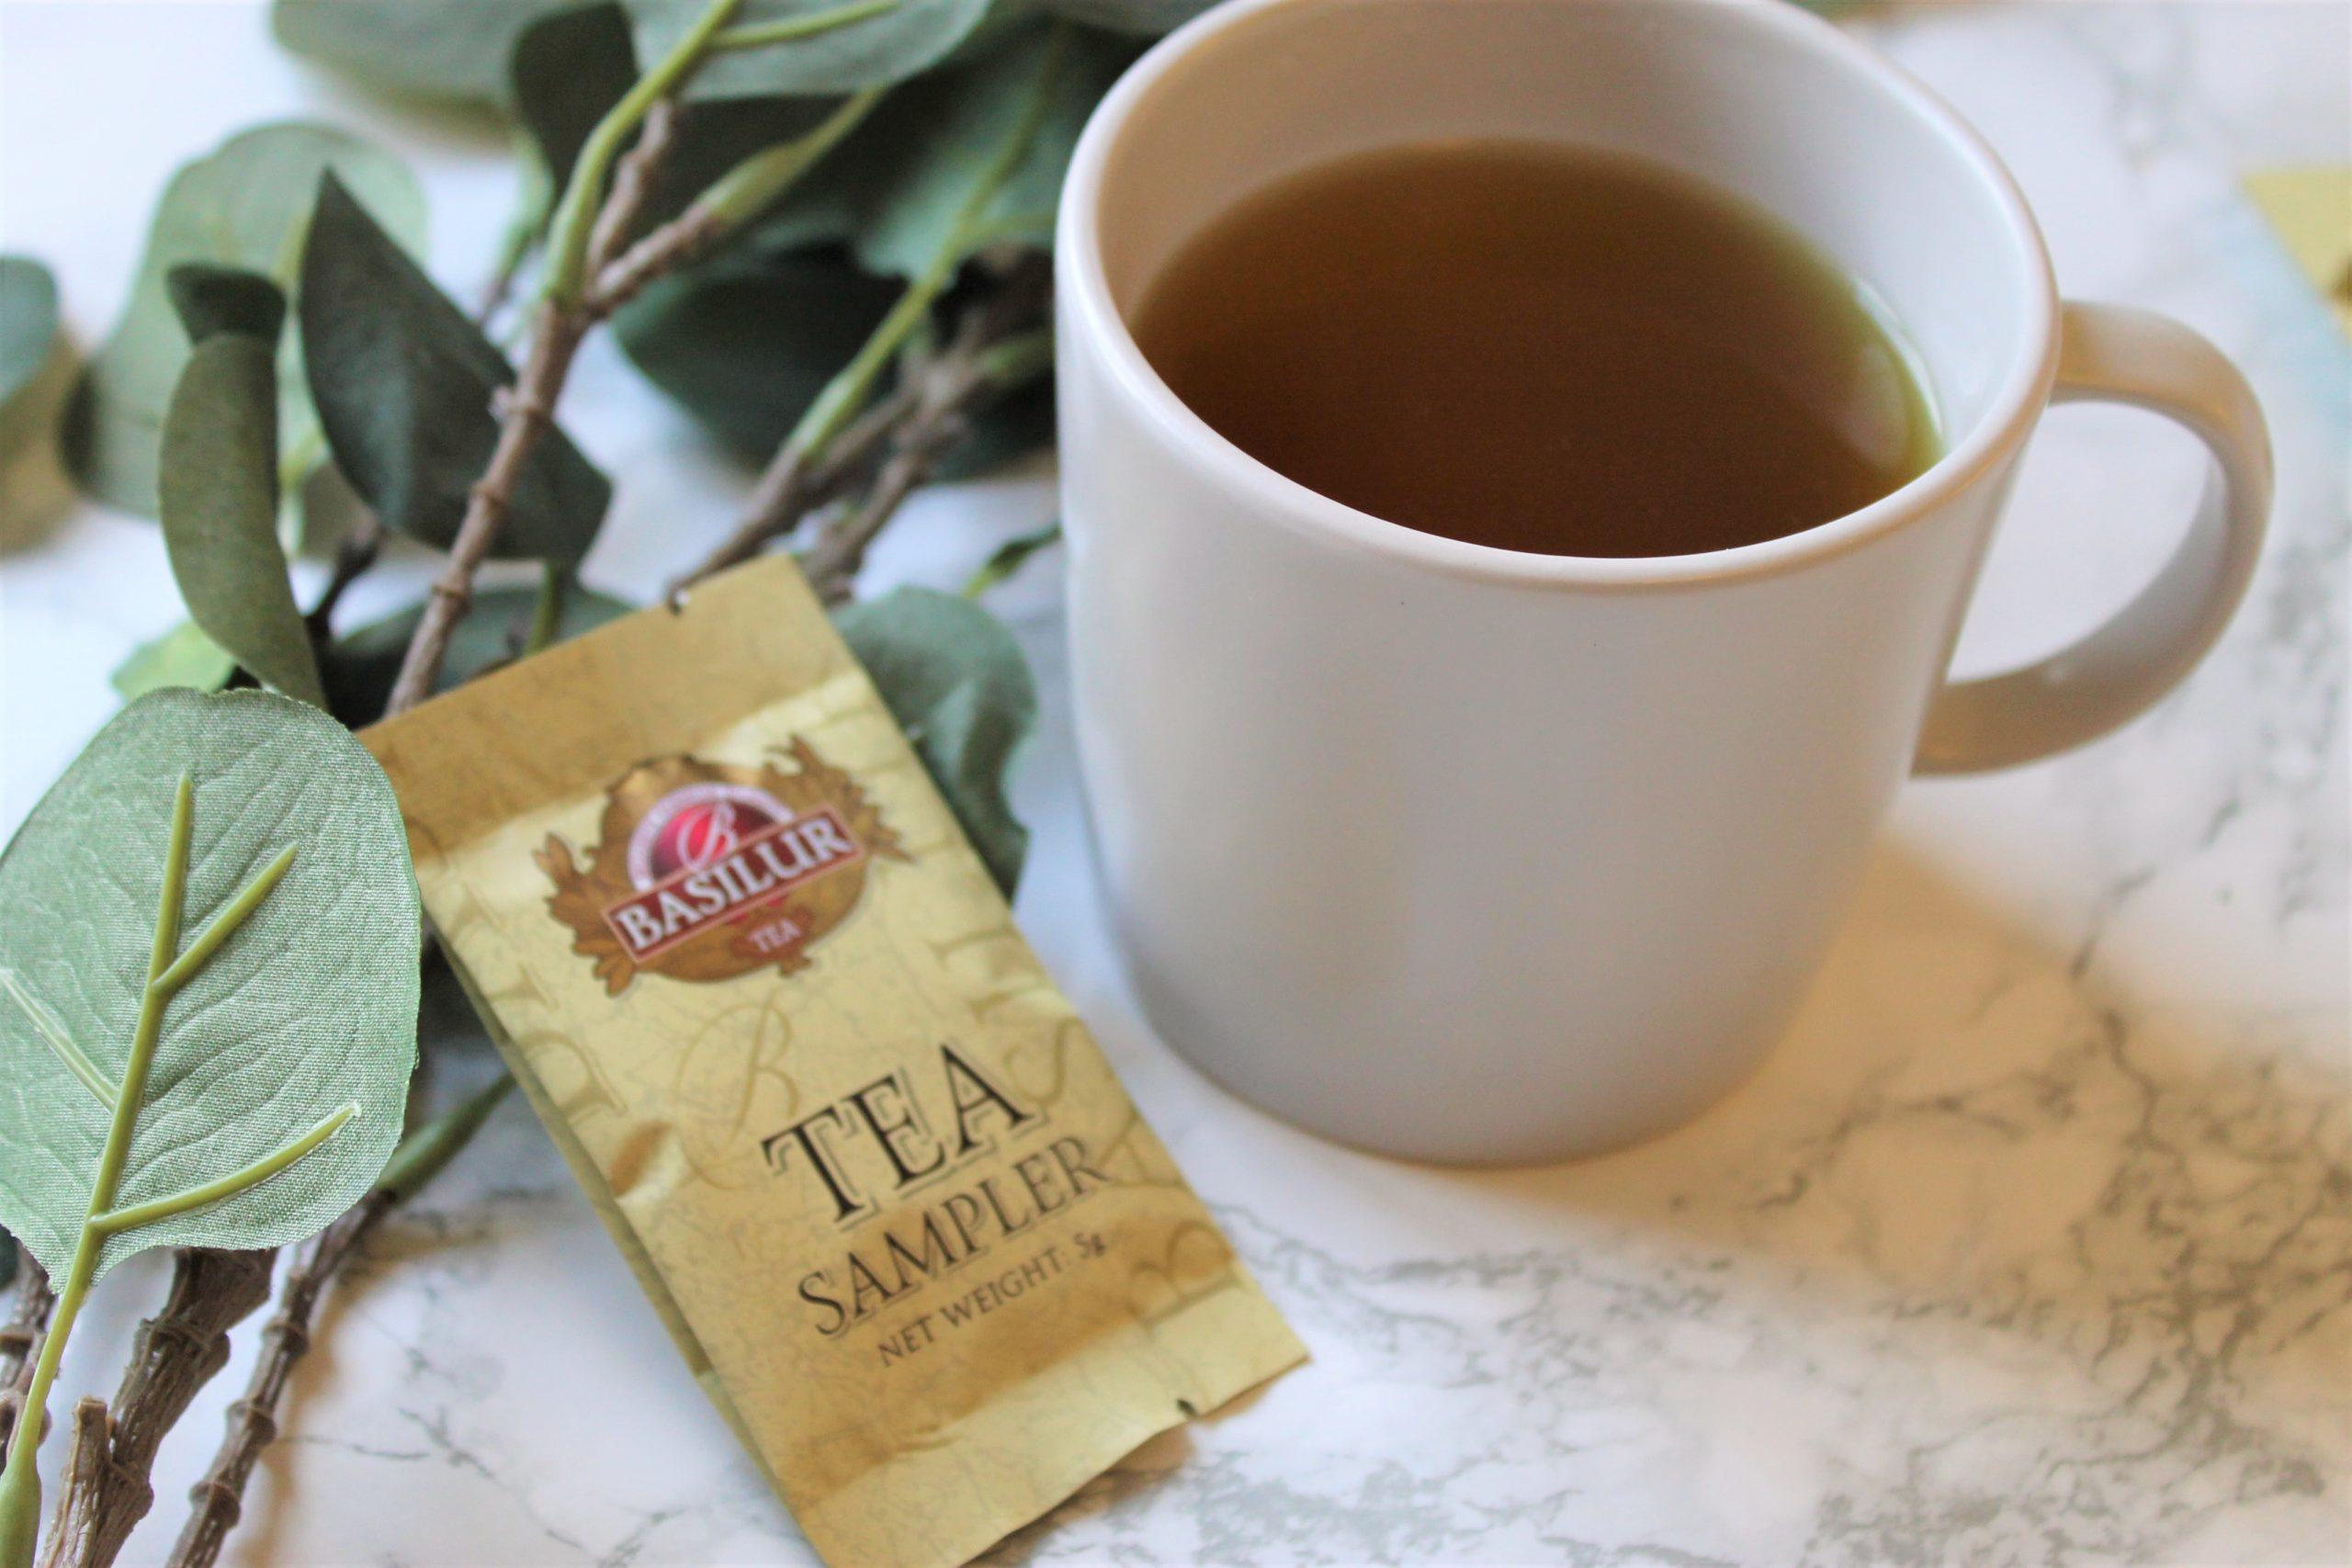 basilur herbal tea moringa sample